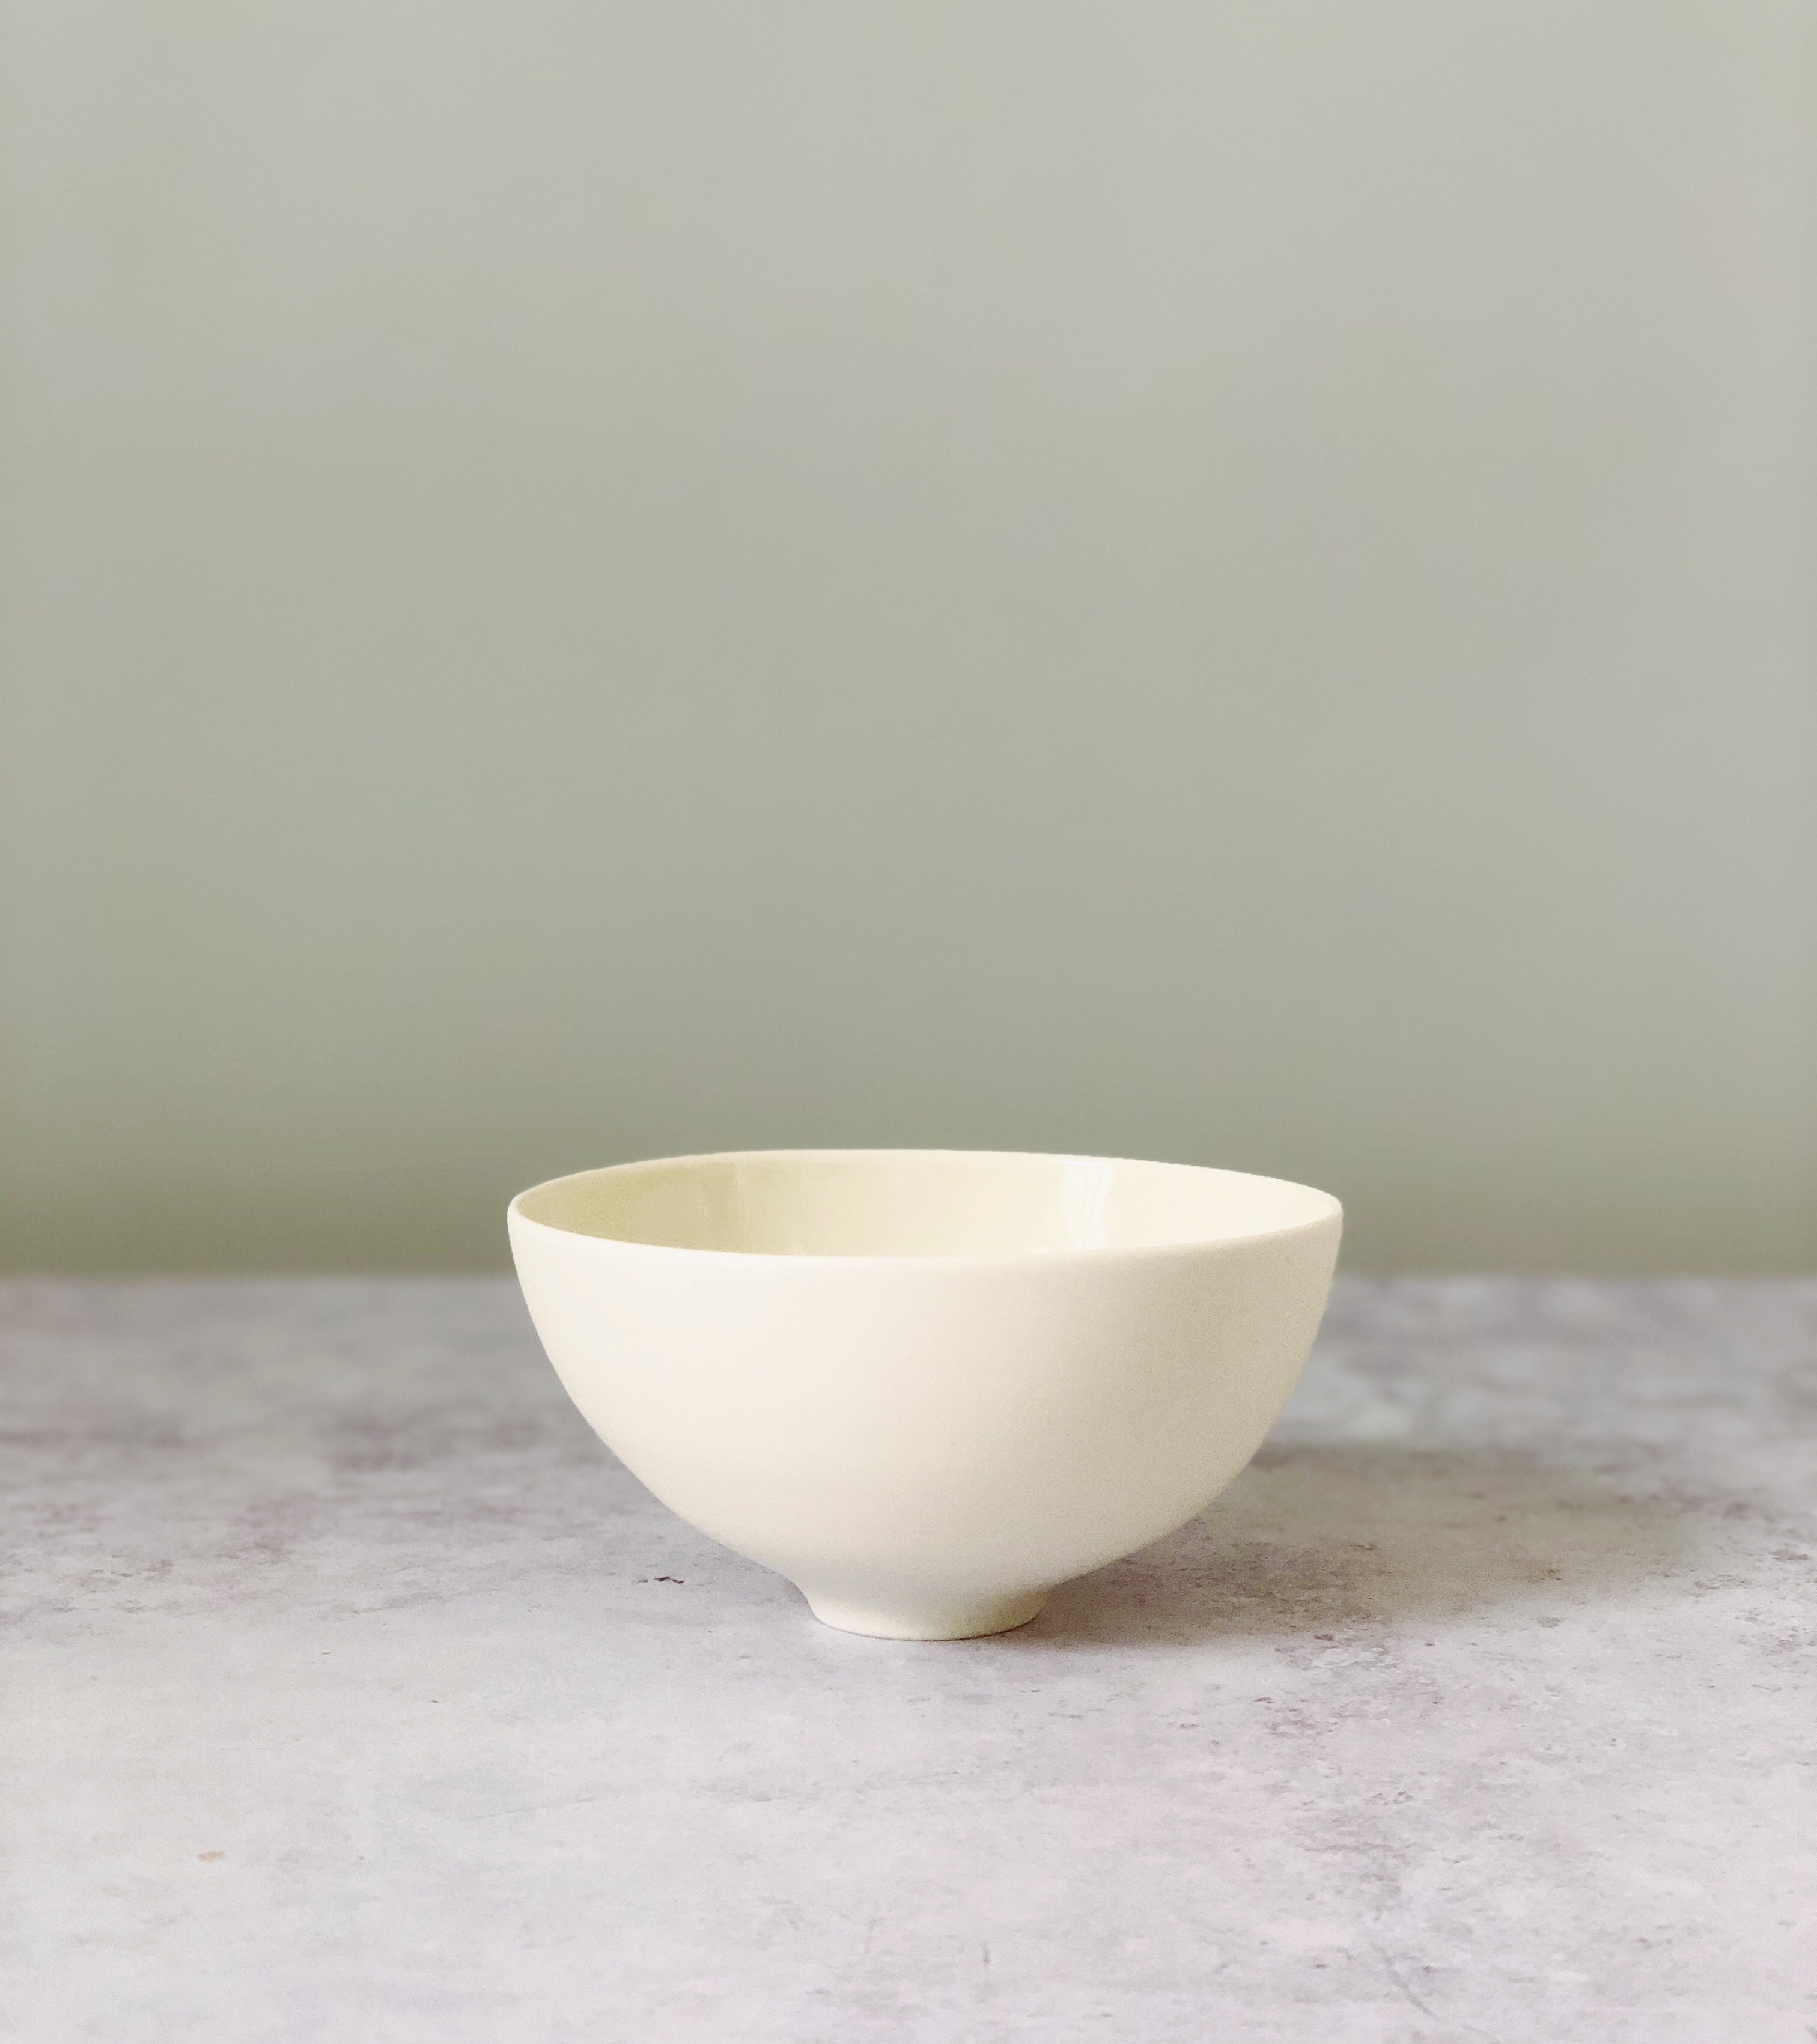 Matcha Cup - Porcelain Chawan